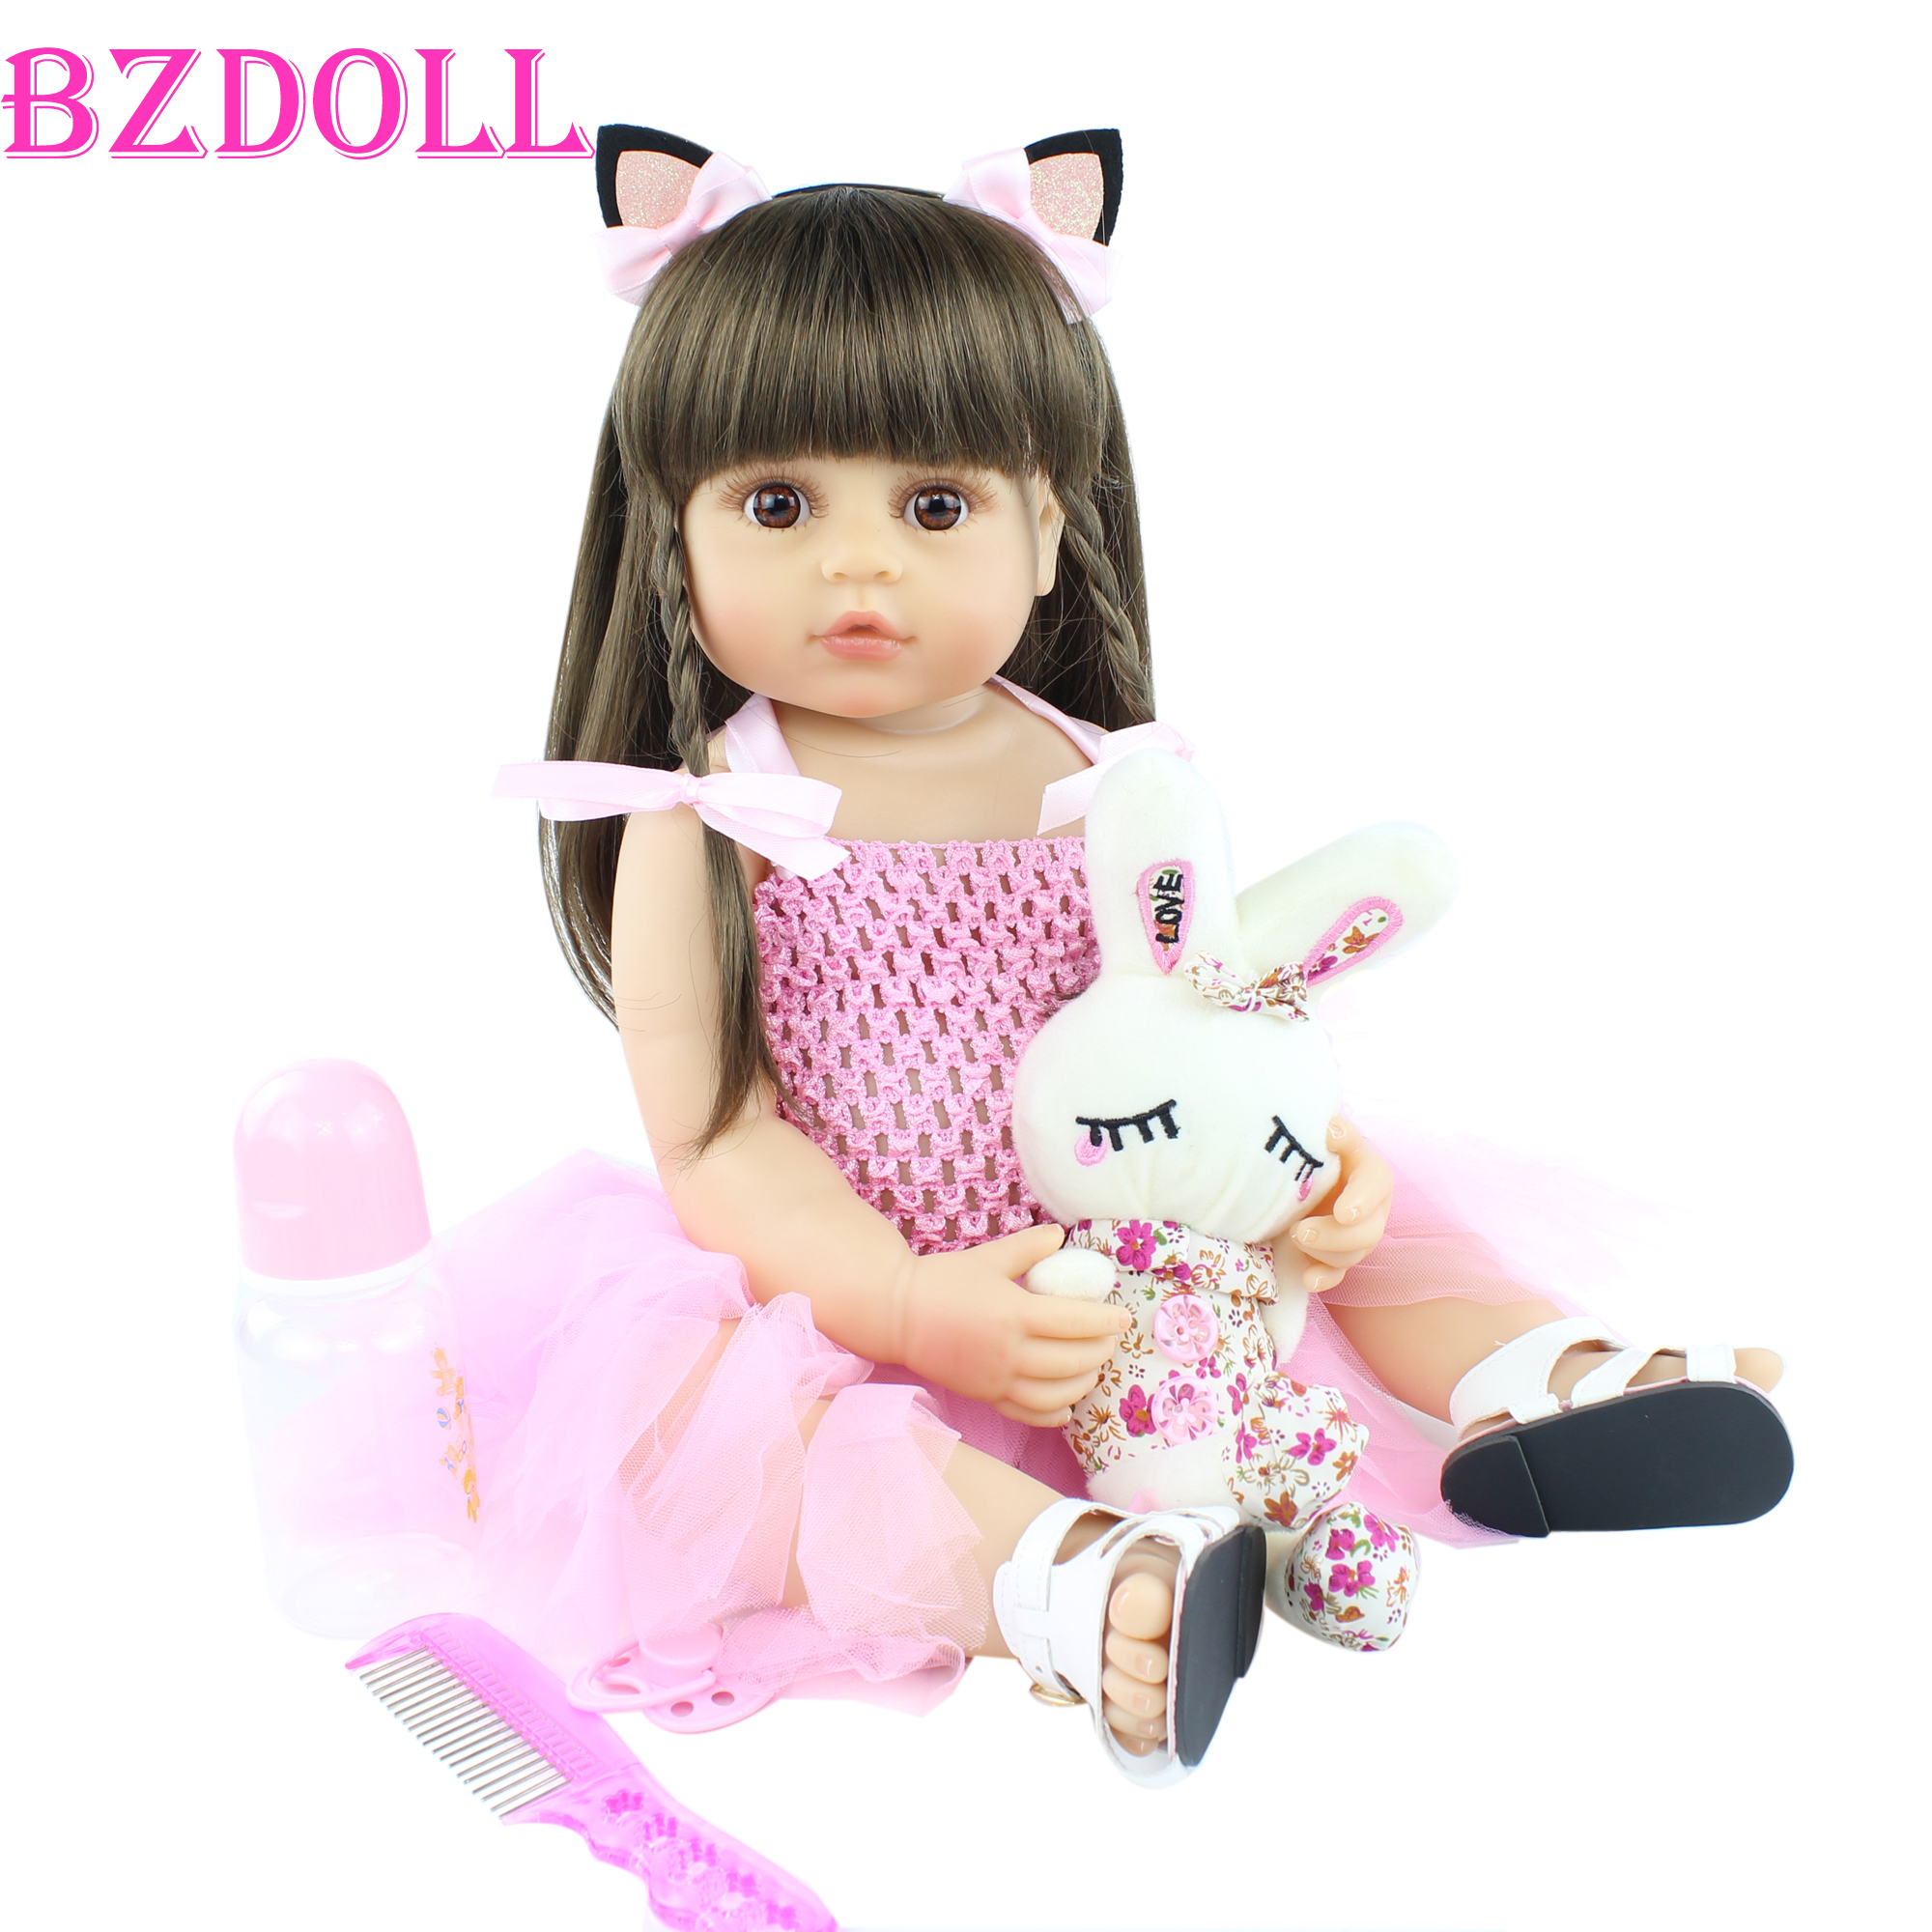 55cm Lifelike Baby Reborn Doll For Girl Full Body Soft Silicone Newborn Toddler Bebe Boneca Kid Birthday Gift Popular Bath Toy